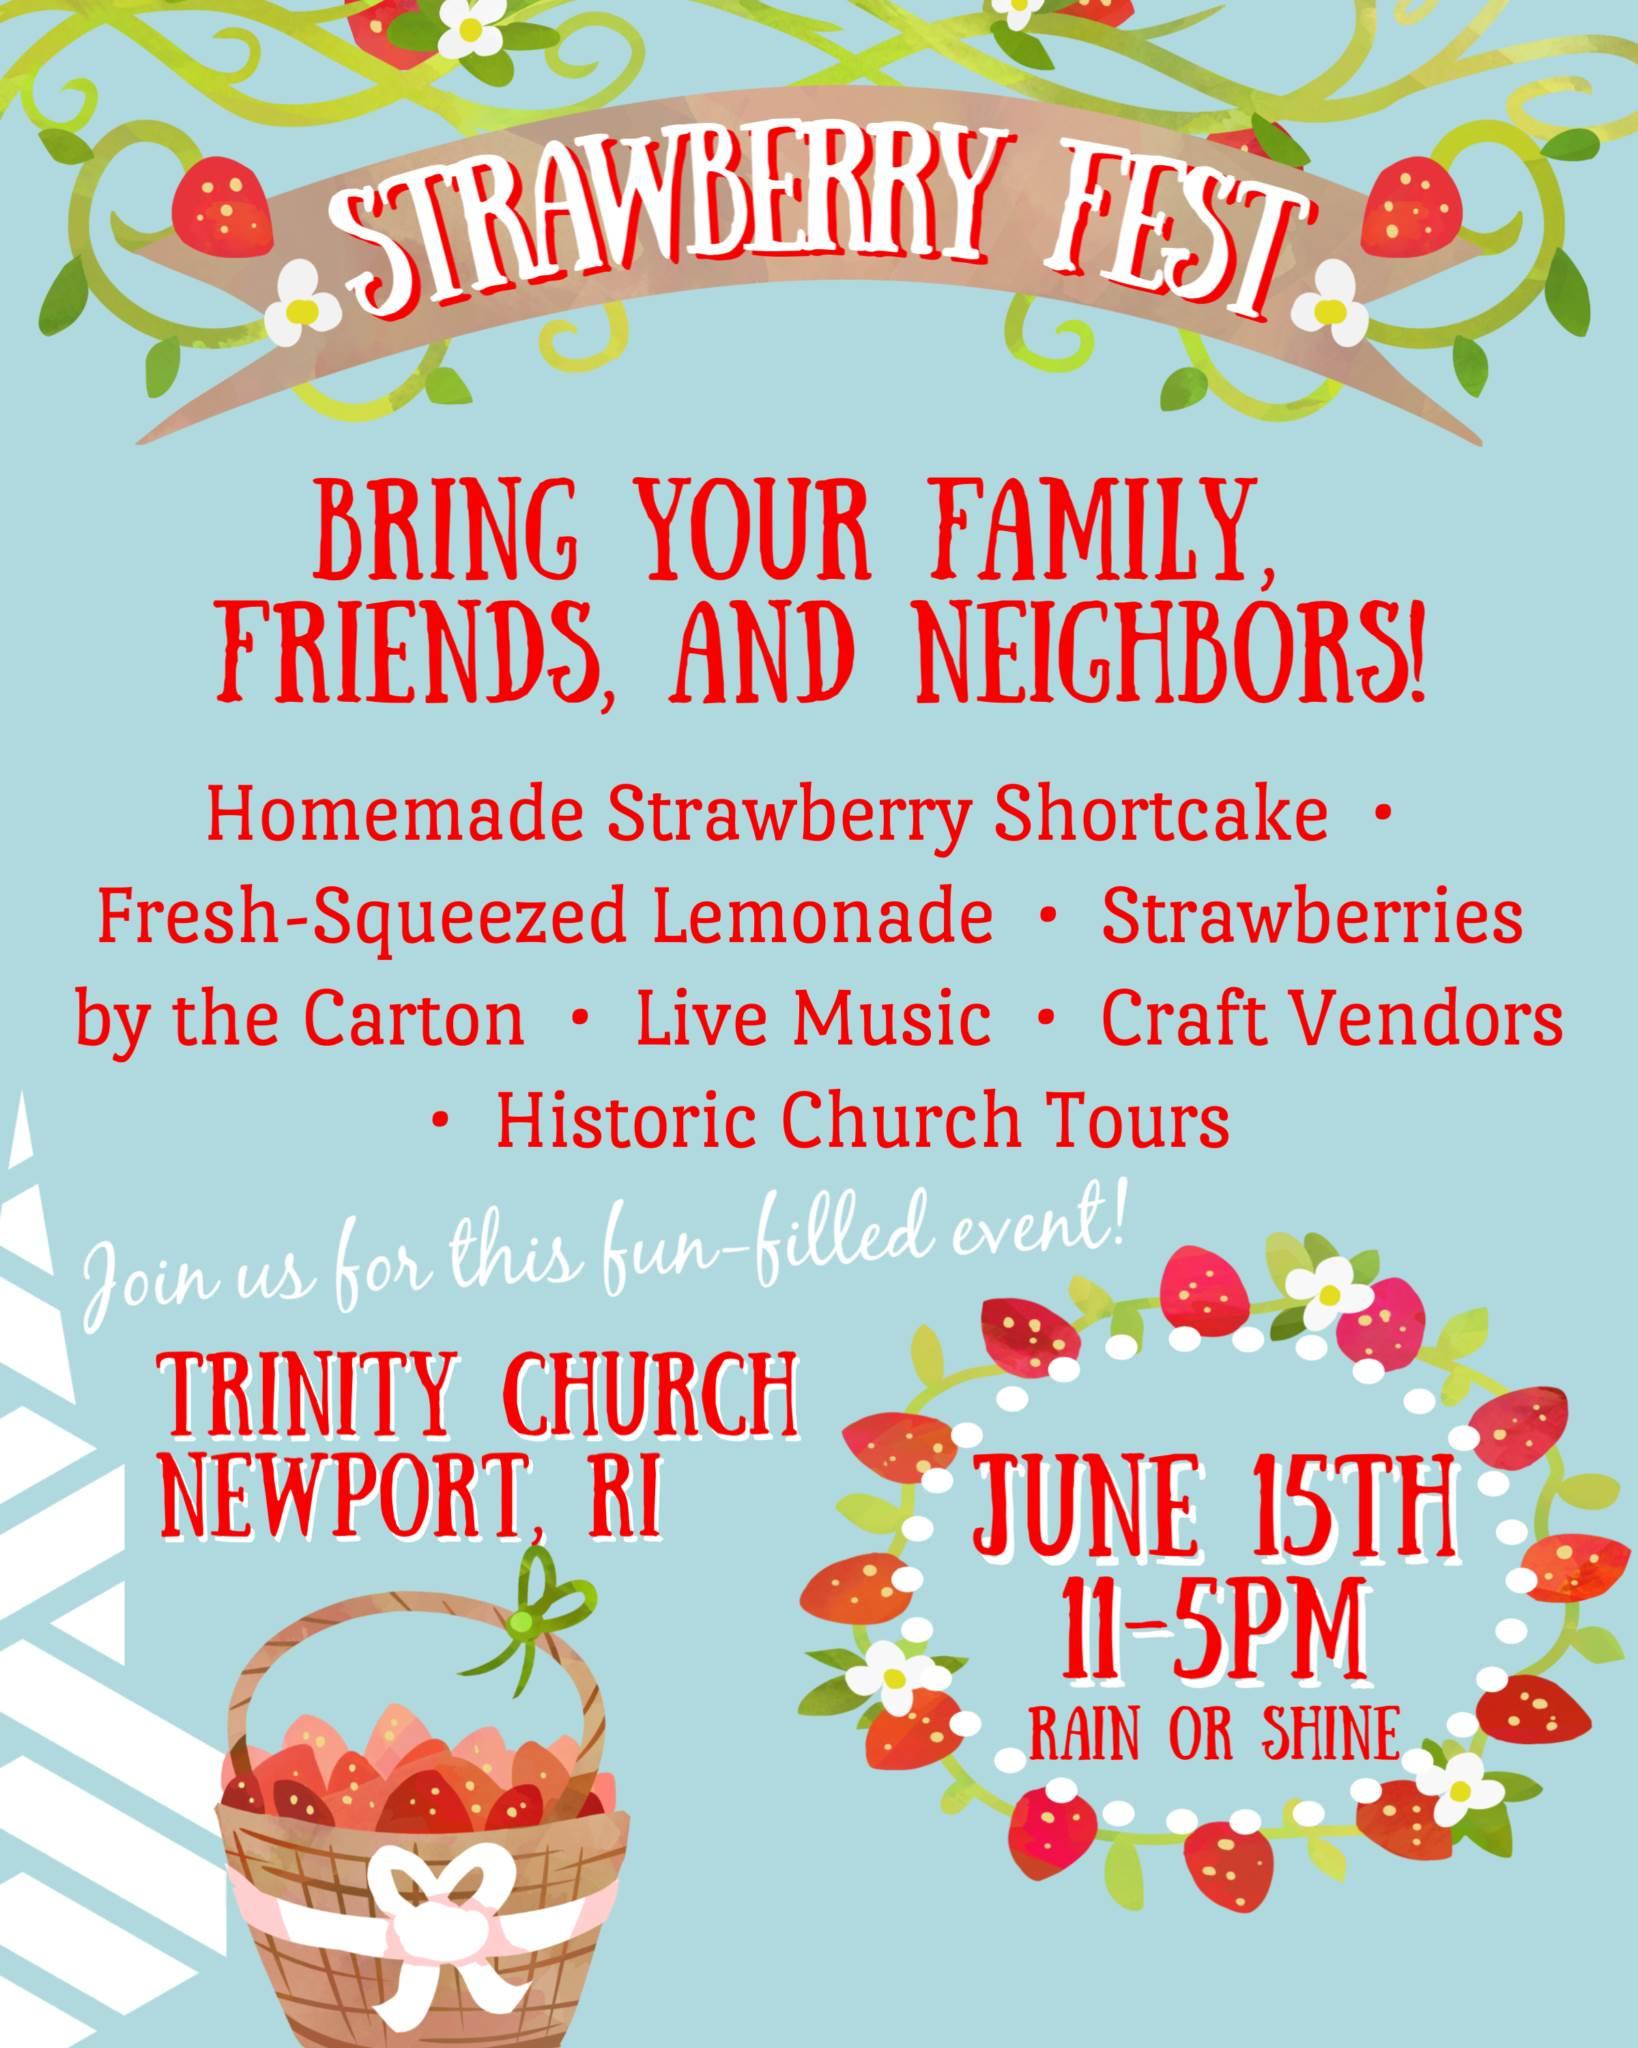 Strawberry Festival Newport.jpg